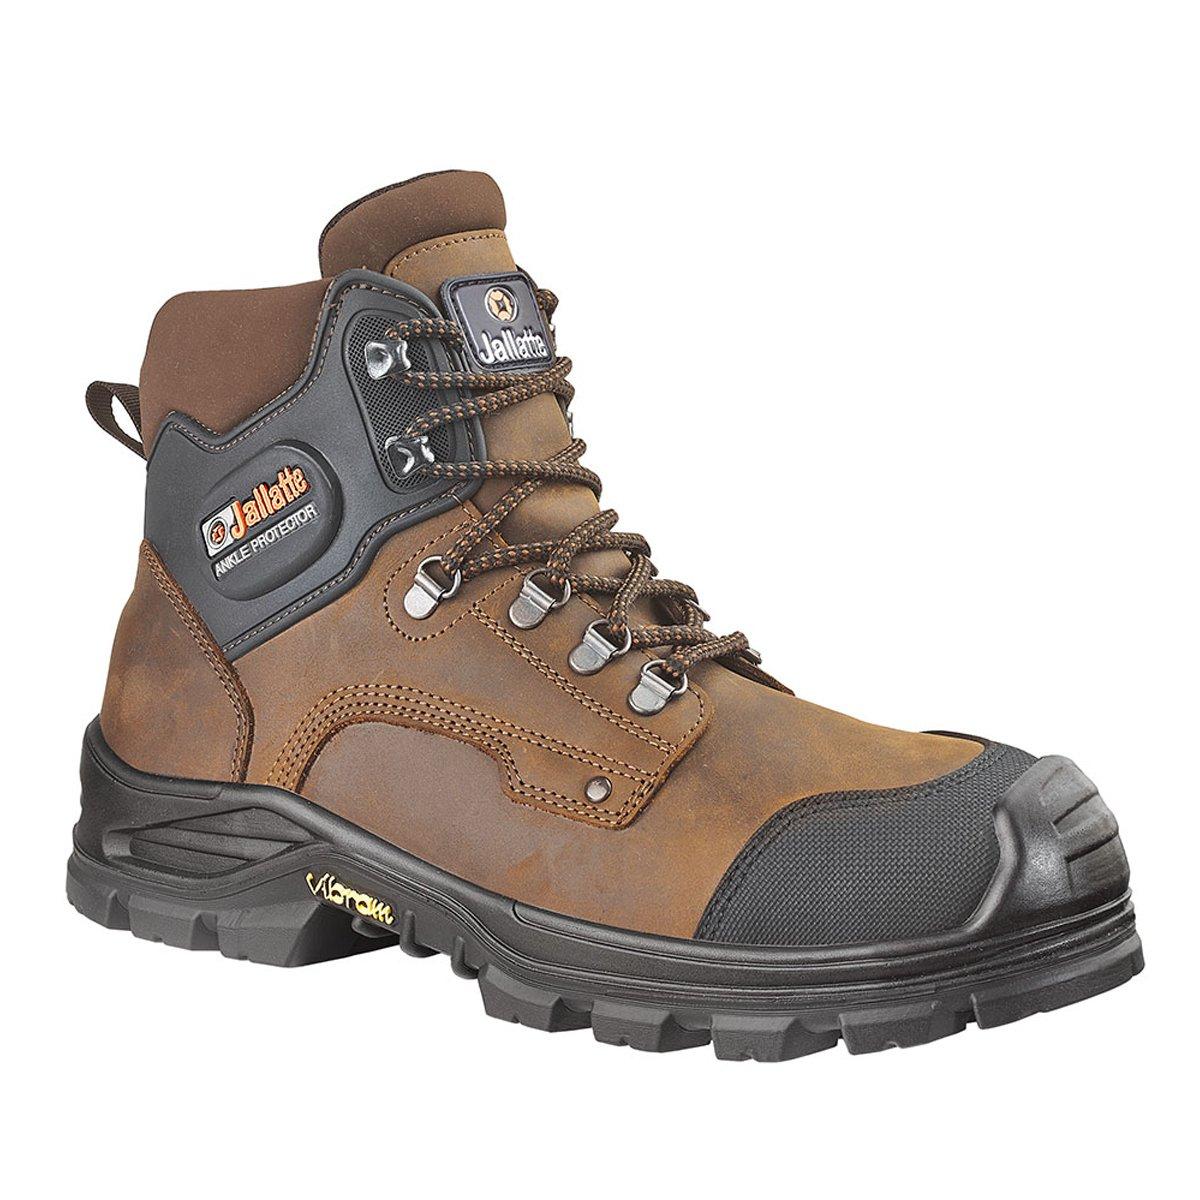 Jallatte – Schuhe Hohe jalirok S3 CI HI HRO SRC, mehrfarbig, 1001548001 B00CXLKRVG Parent